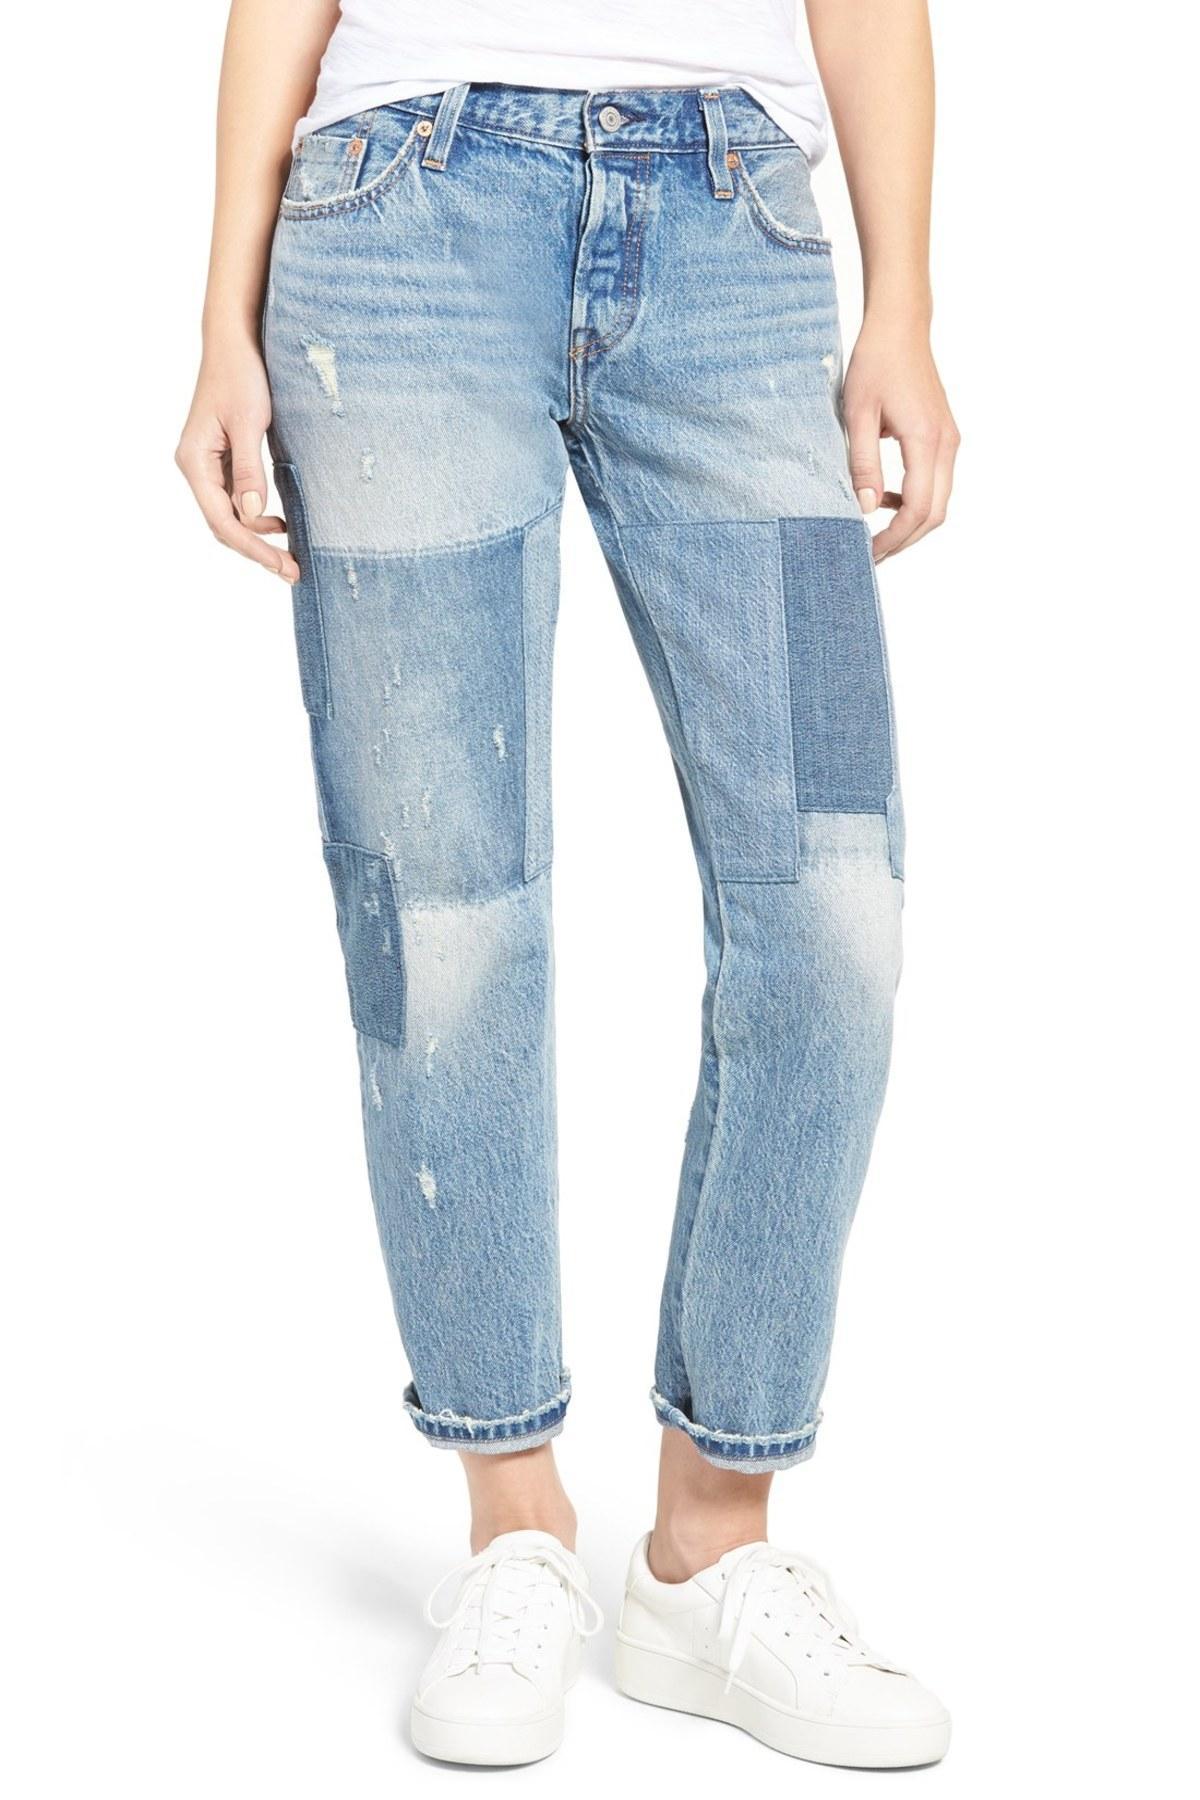 levi 39 s r 501 r ct boyfriend jeans stacked patch blue. Black Bedroom Furniture Sets. Home Design Ideas